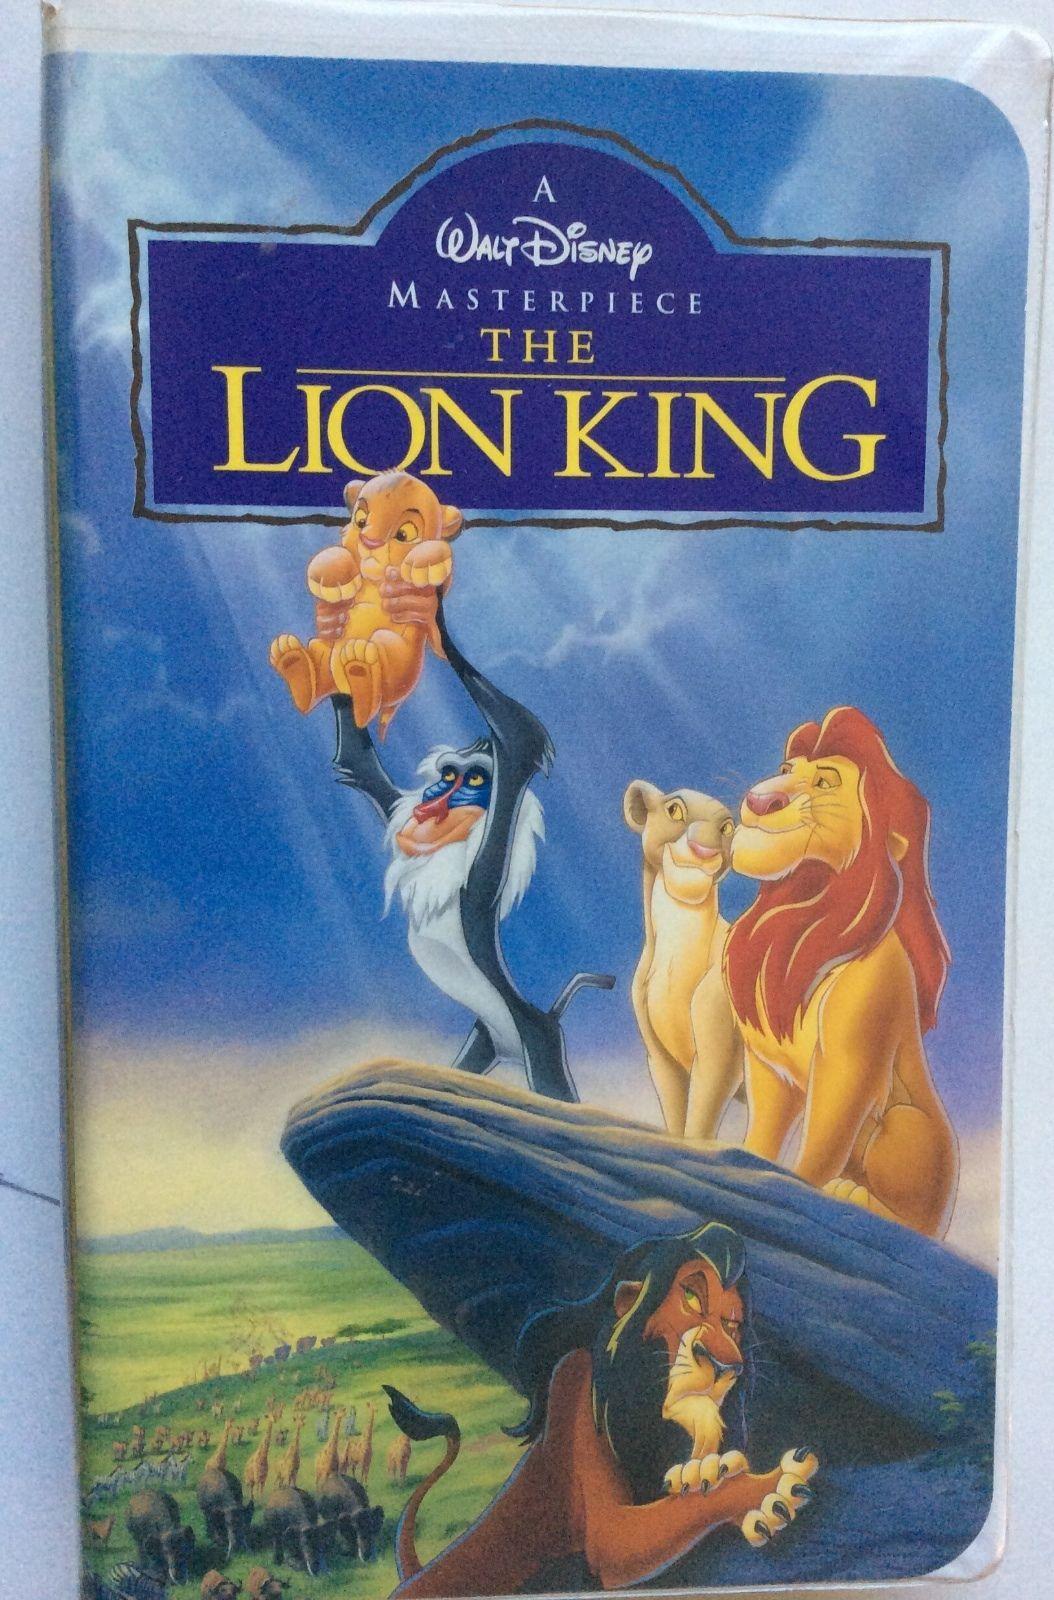 walt disney u0026 39 s masterpiece the lion king vhs video tape